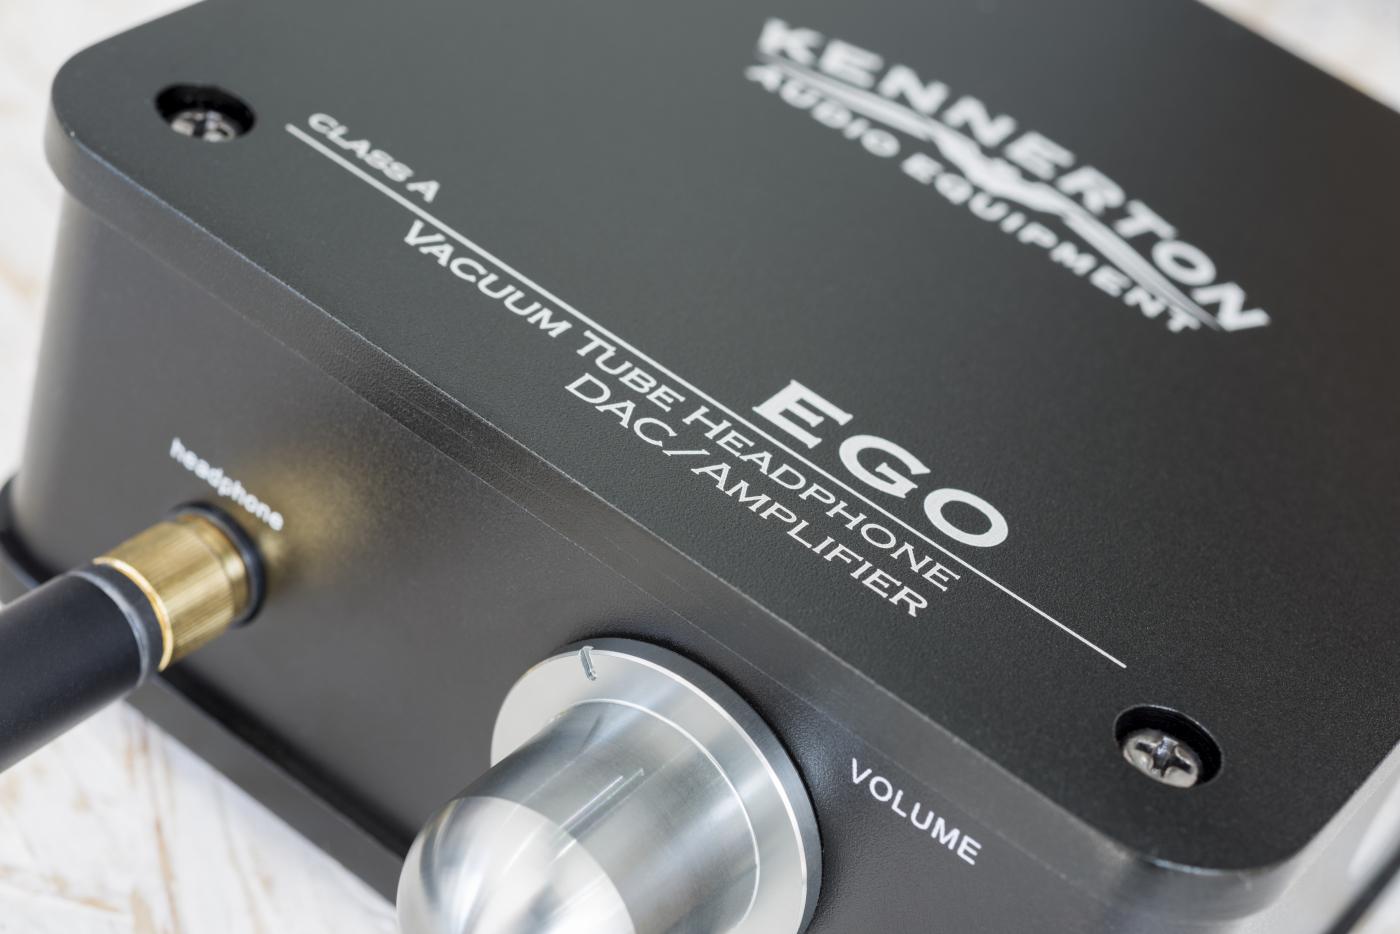 Kennerton EGO DAC and Headphone Amp